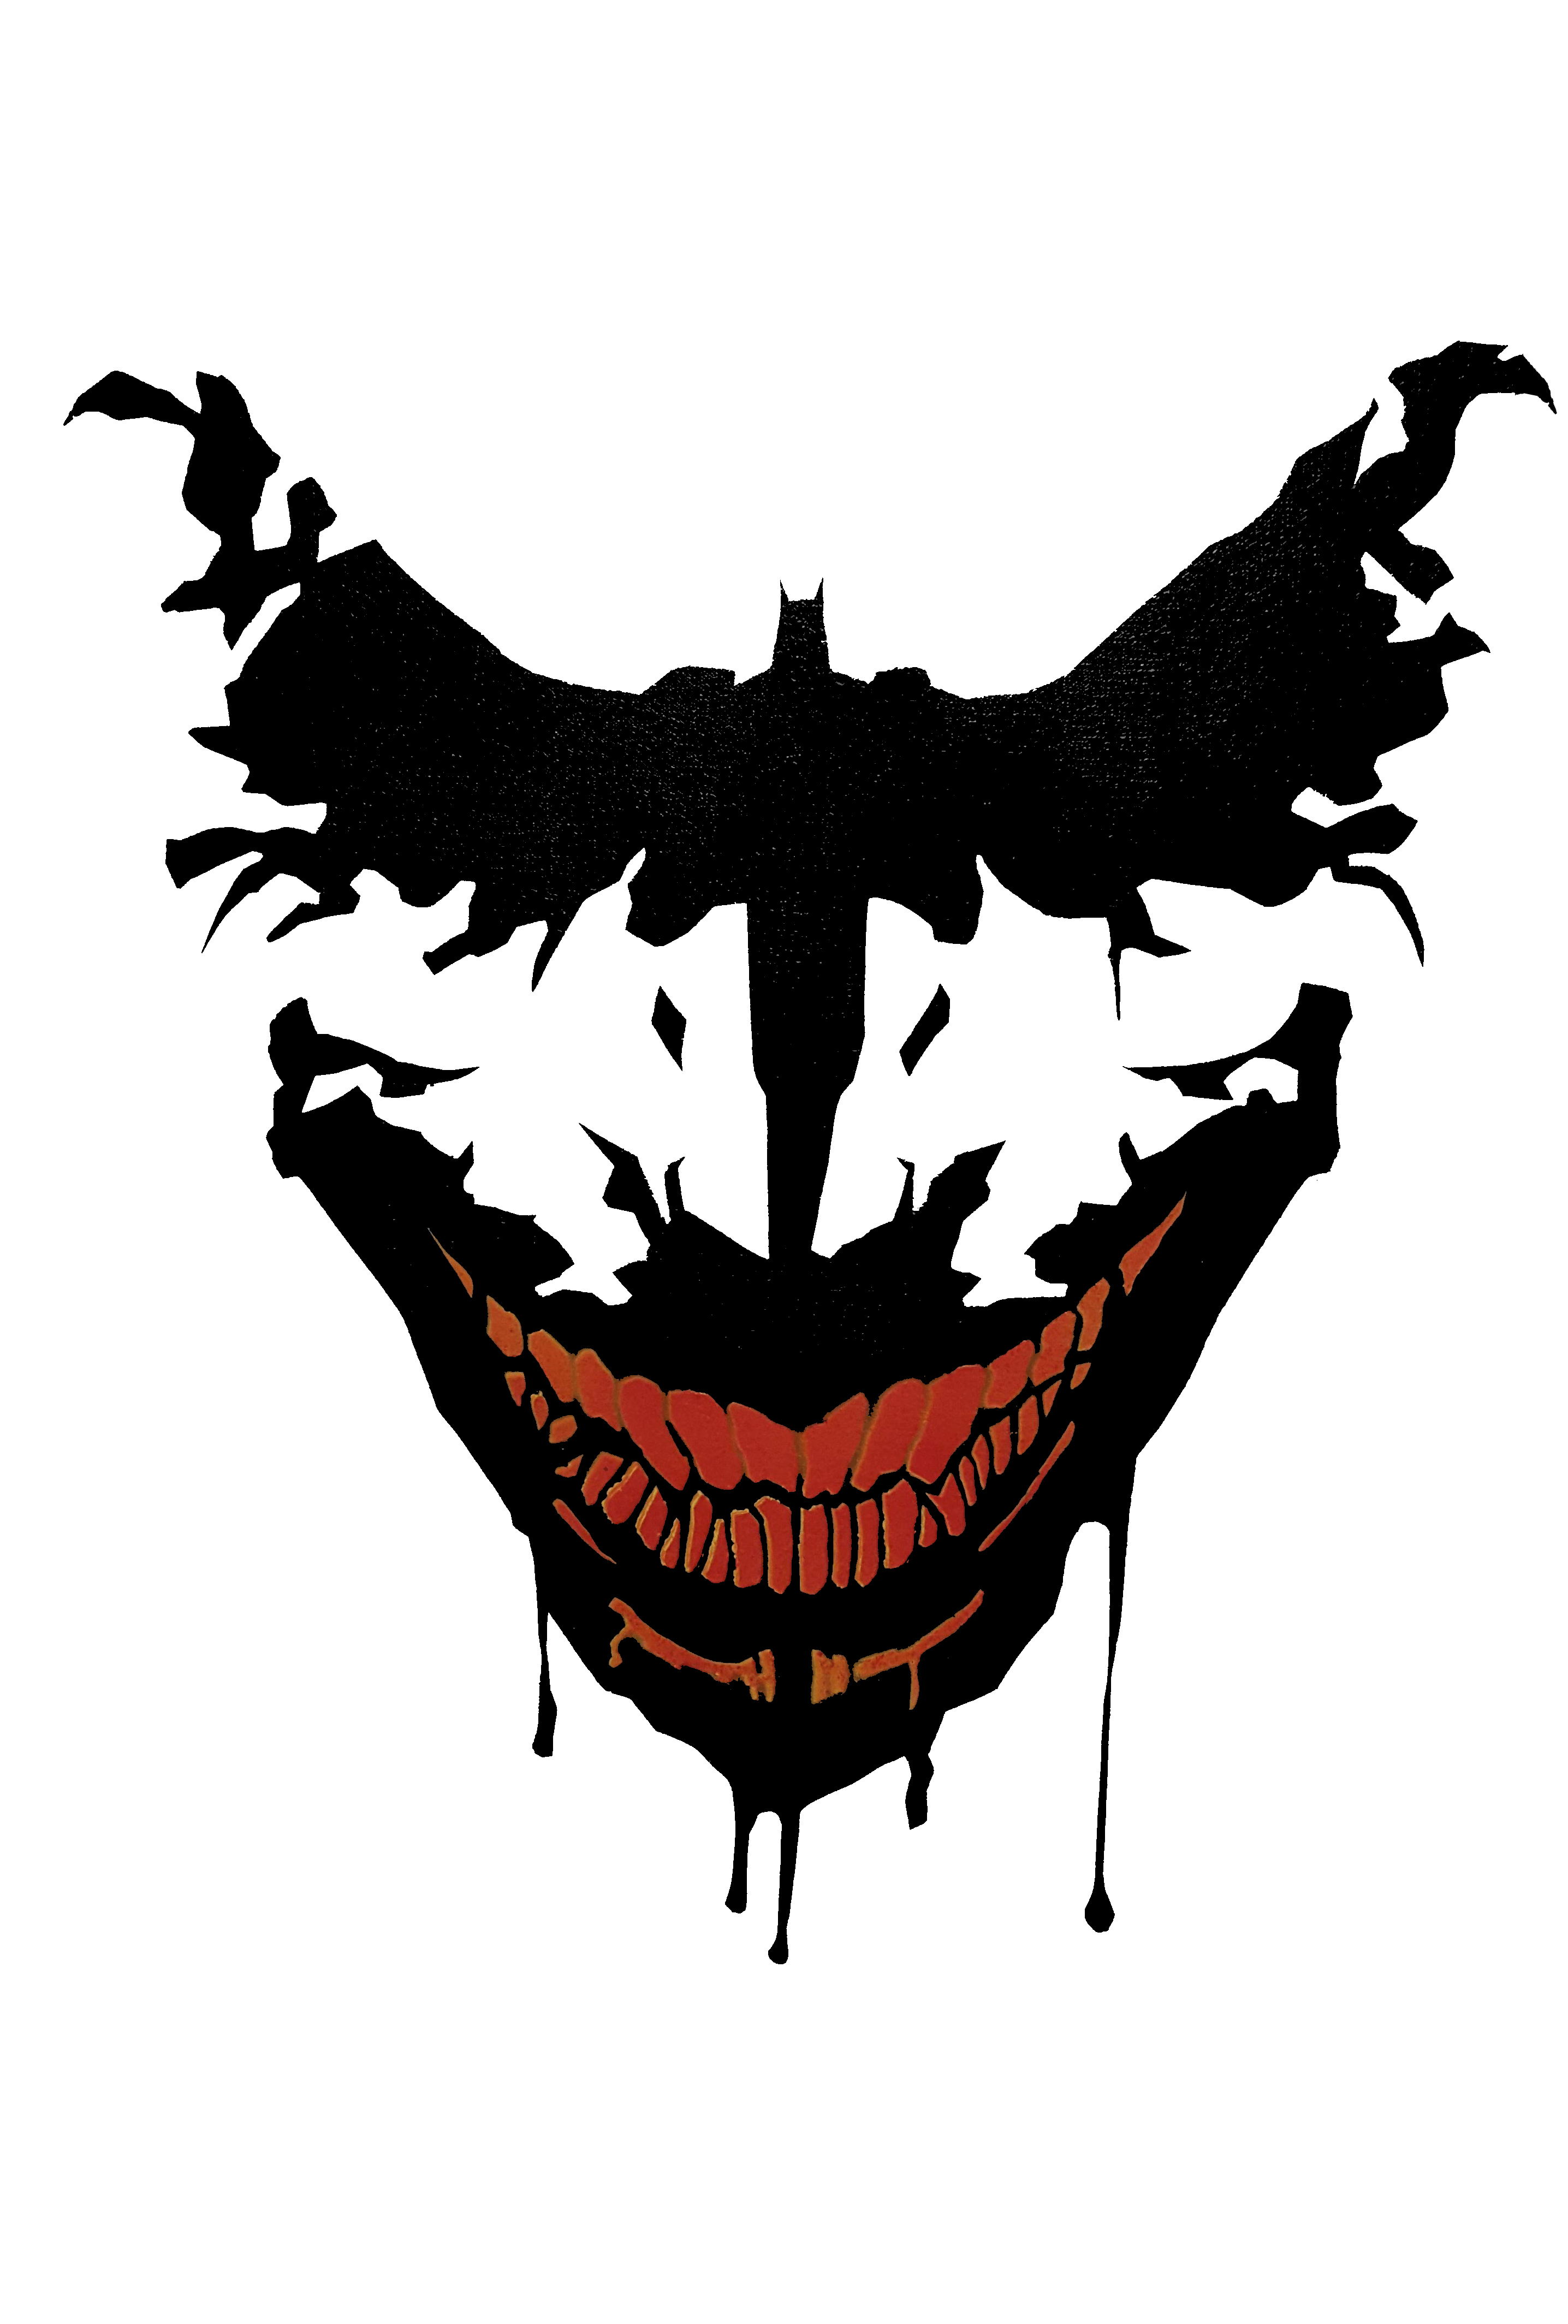 Joker logo u see what u want zain batman comics